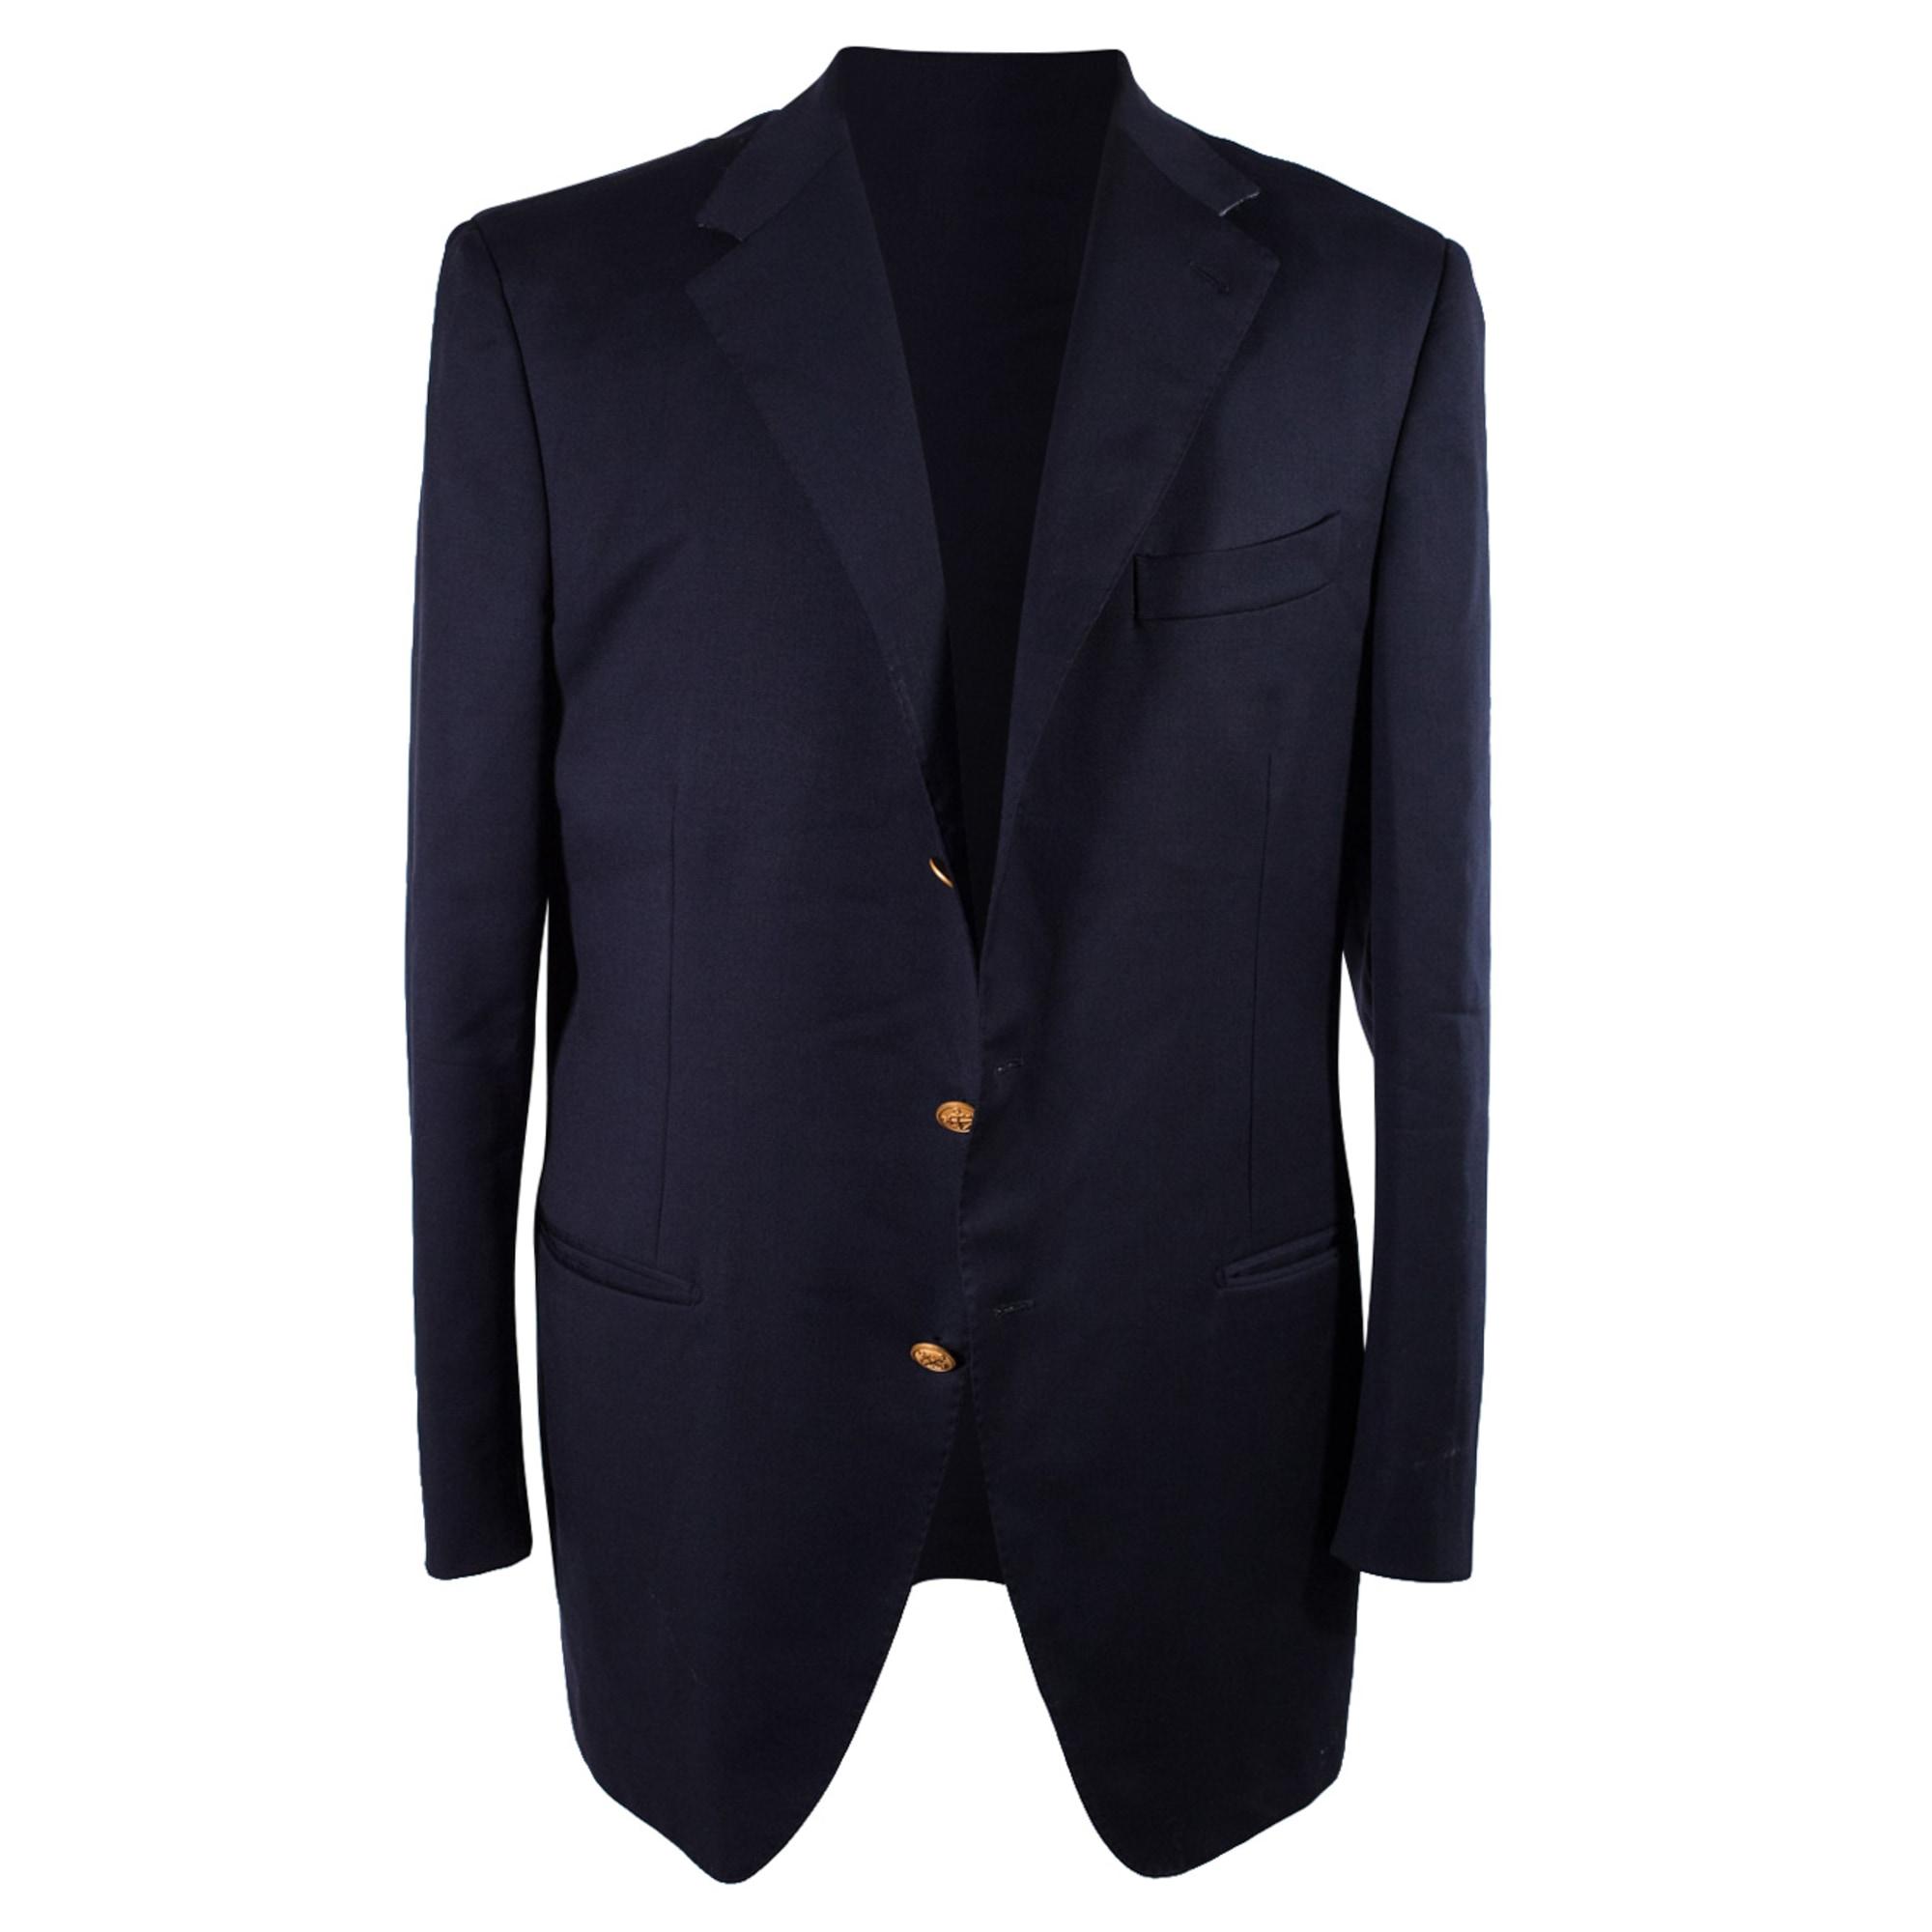 Suit Jacket FAÇONNABLE Blue, navy, turquoise